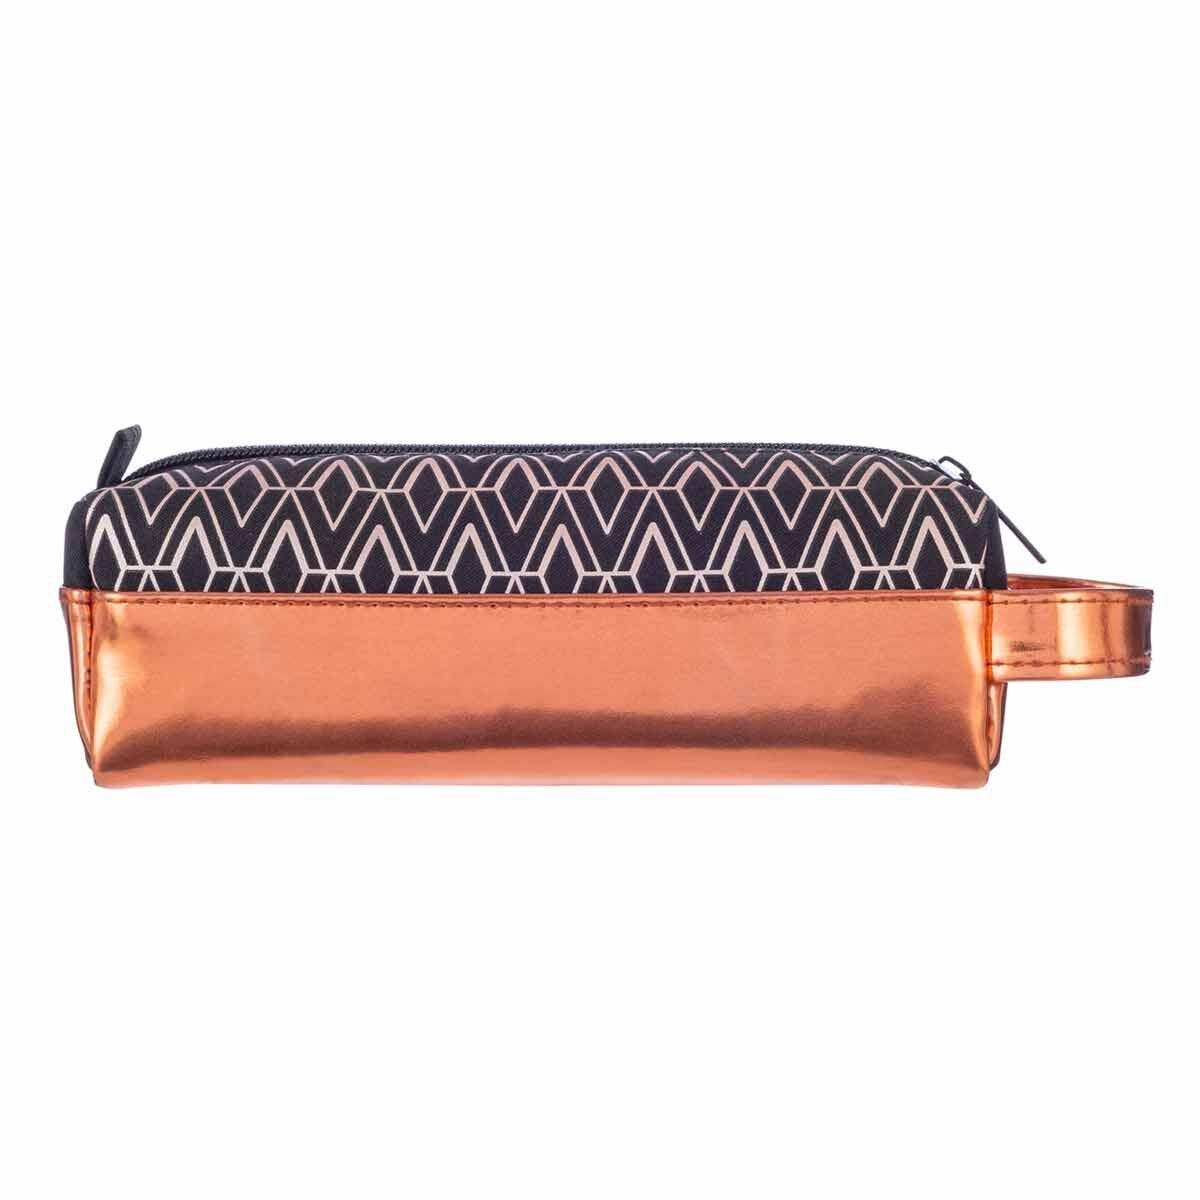 Black and Copper Geo Pencil Case